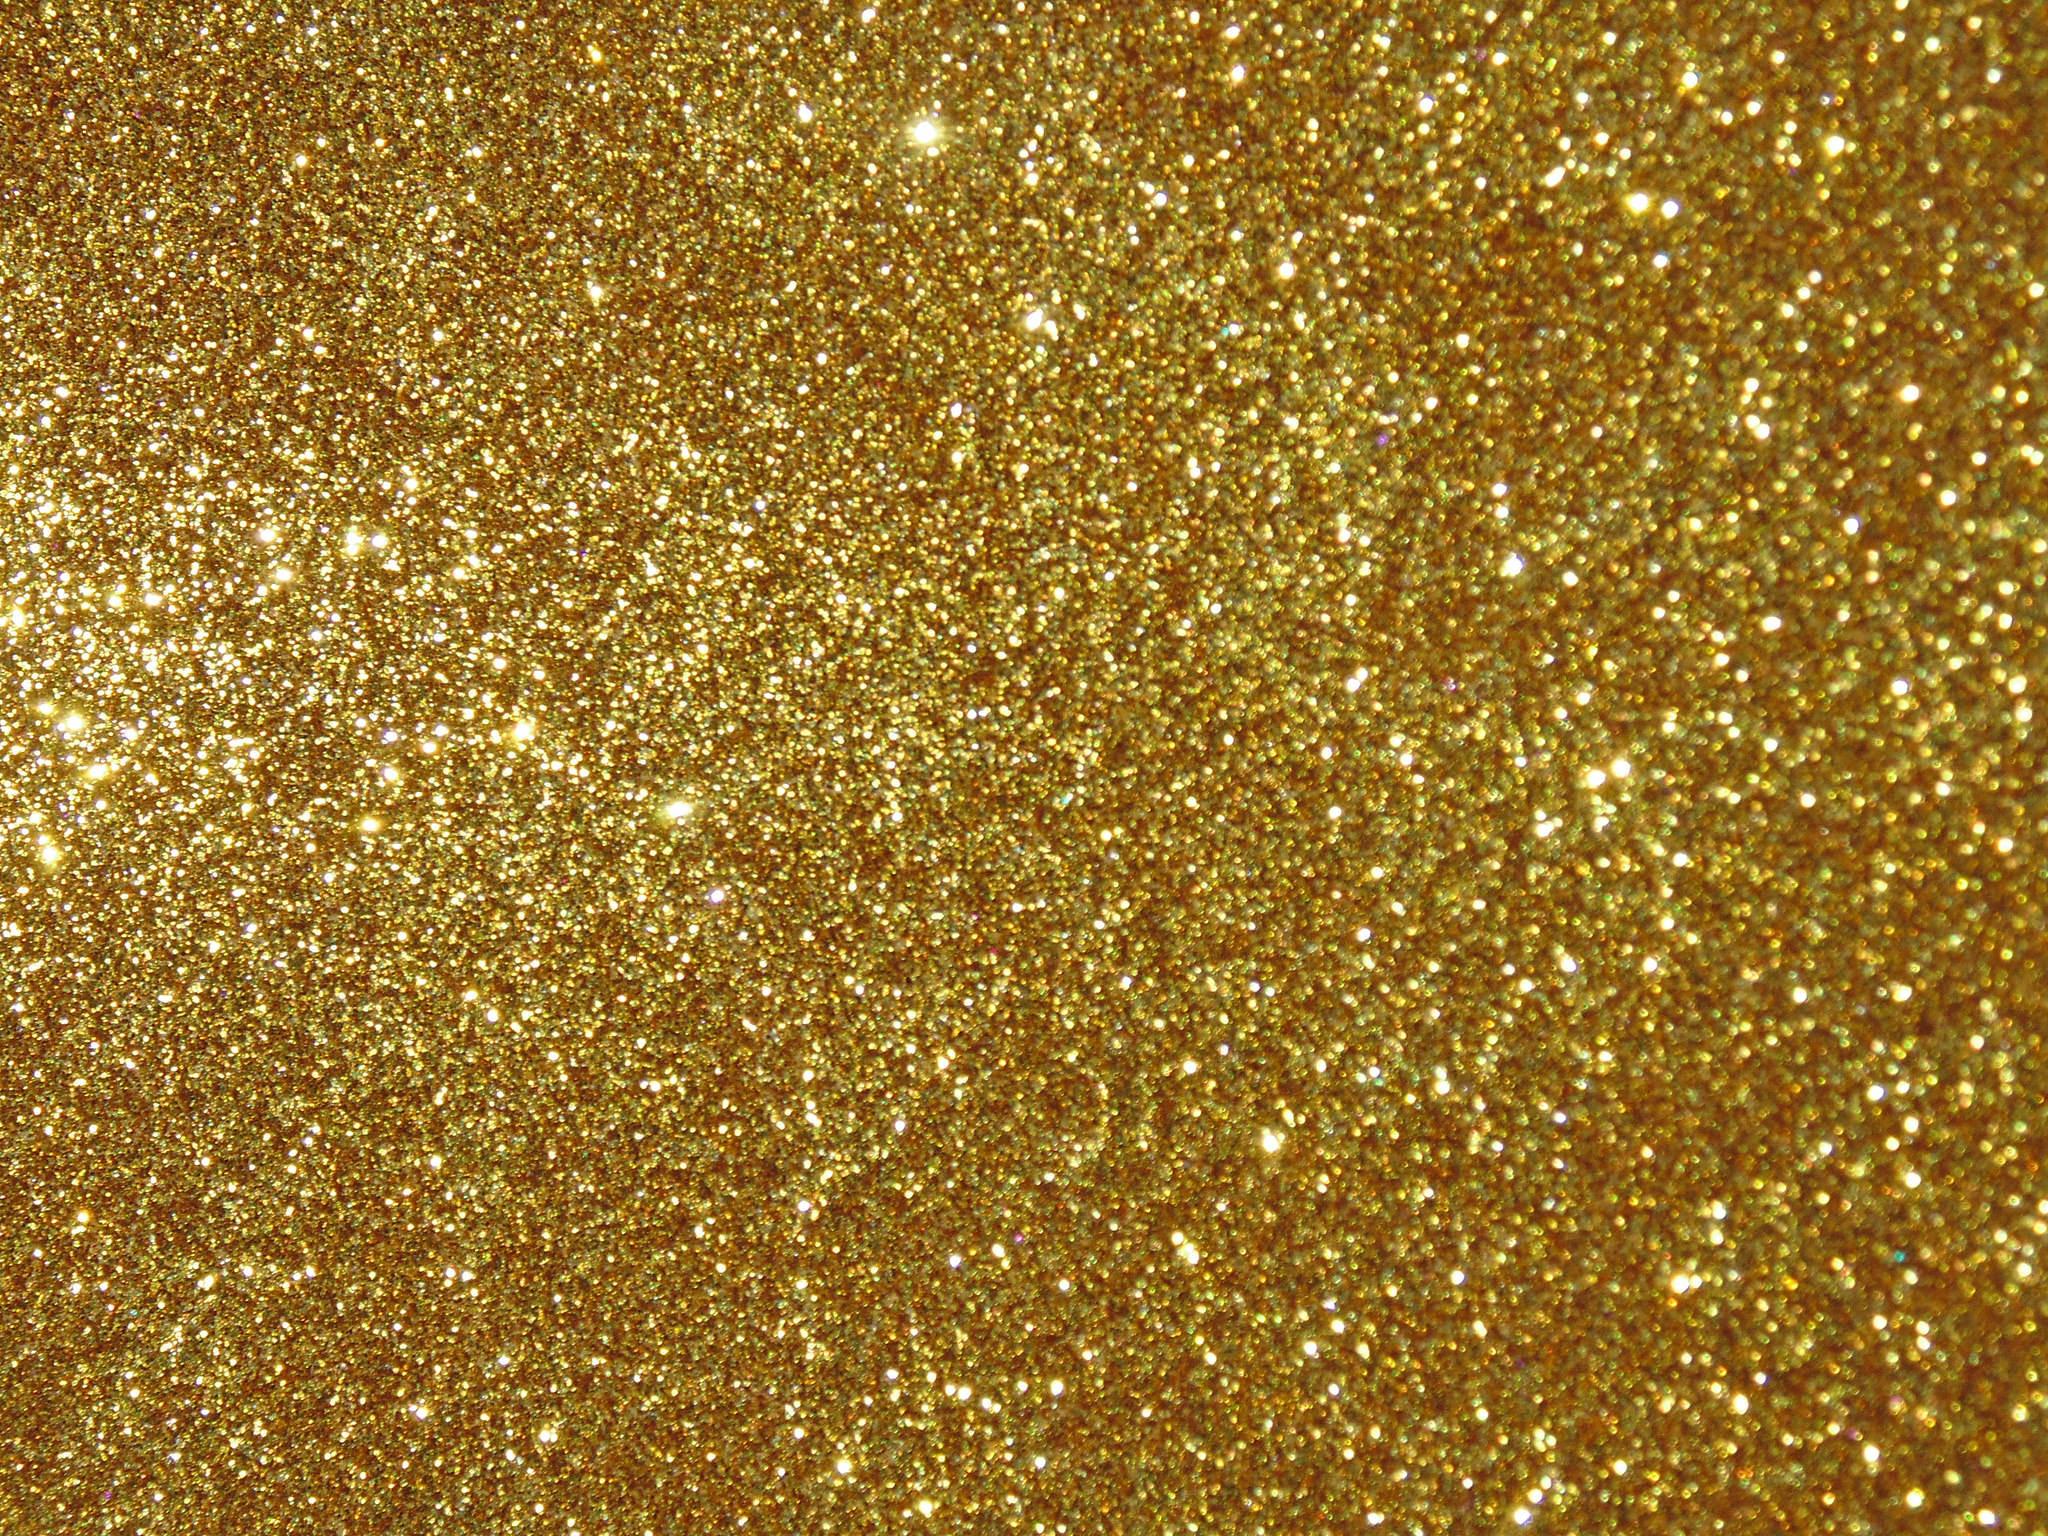 Gold Sparkle Wallpaper 39 Images